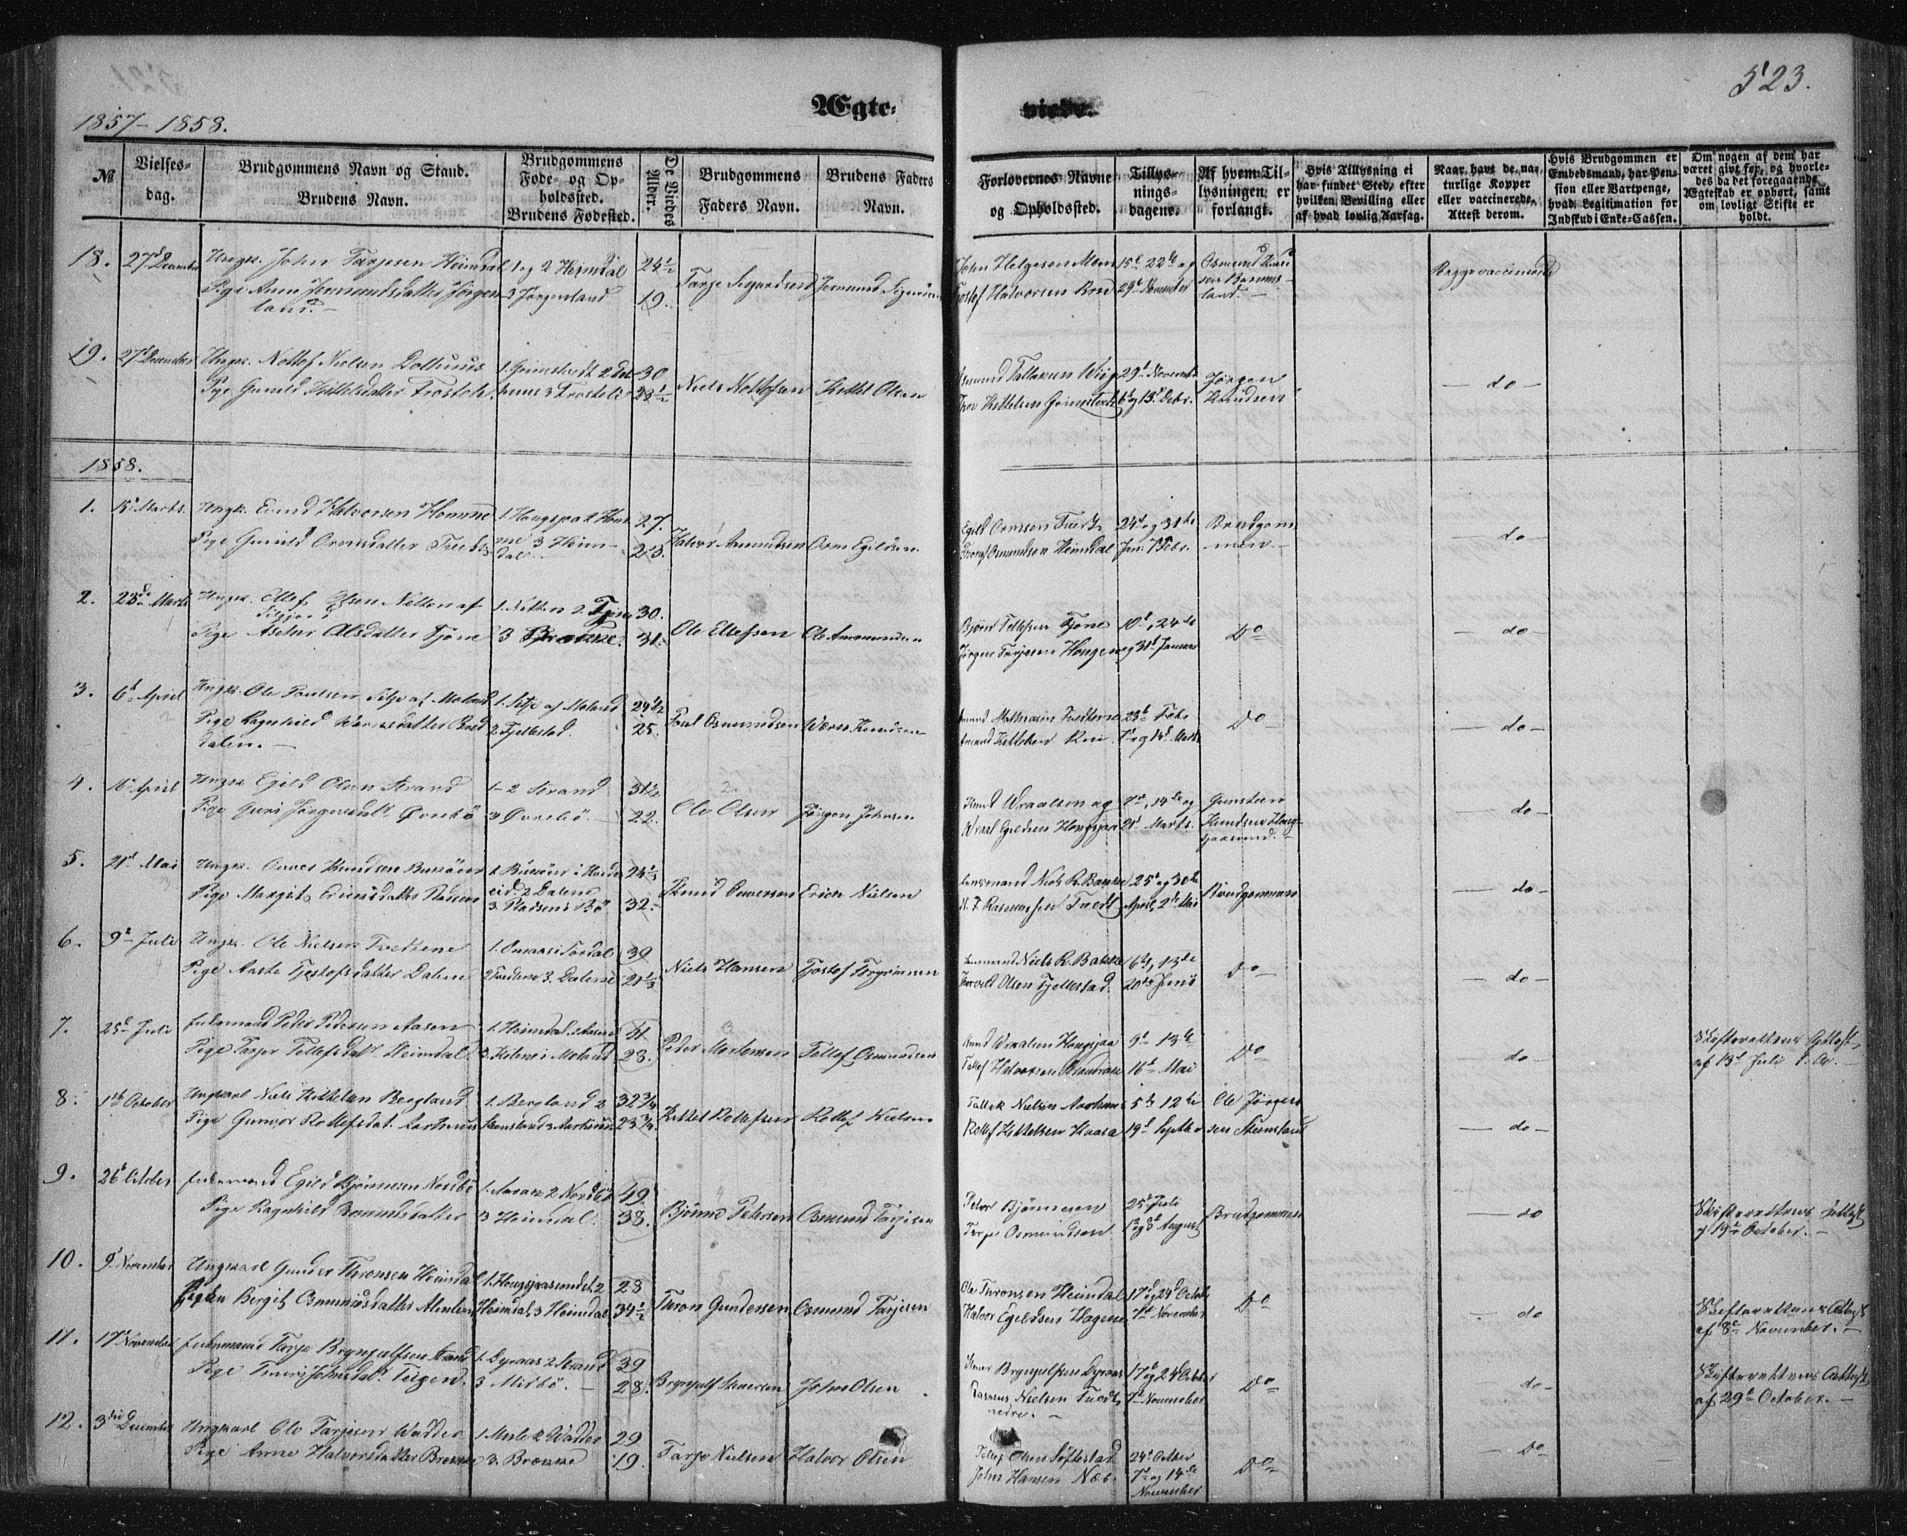 SAKO, Nissedal kirkebøker, F/Fa/L0003: Ministerialbok nr. I 3, 1846-1870, s. 522-523